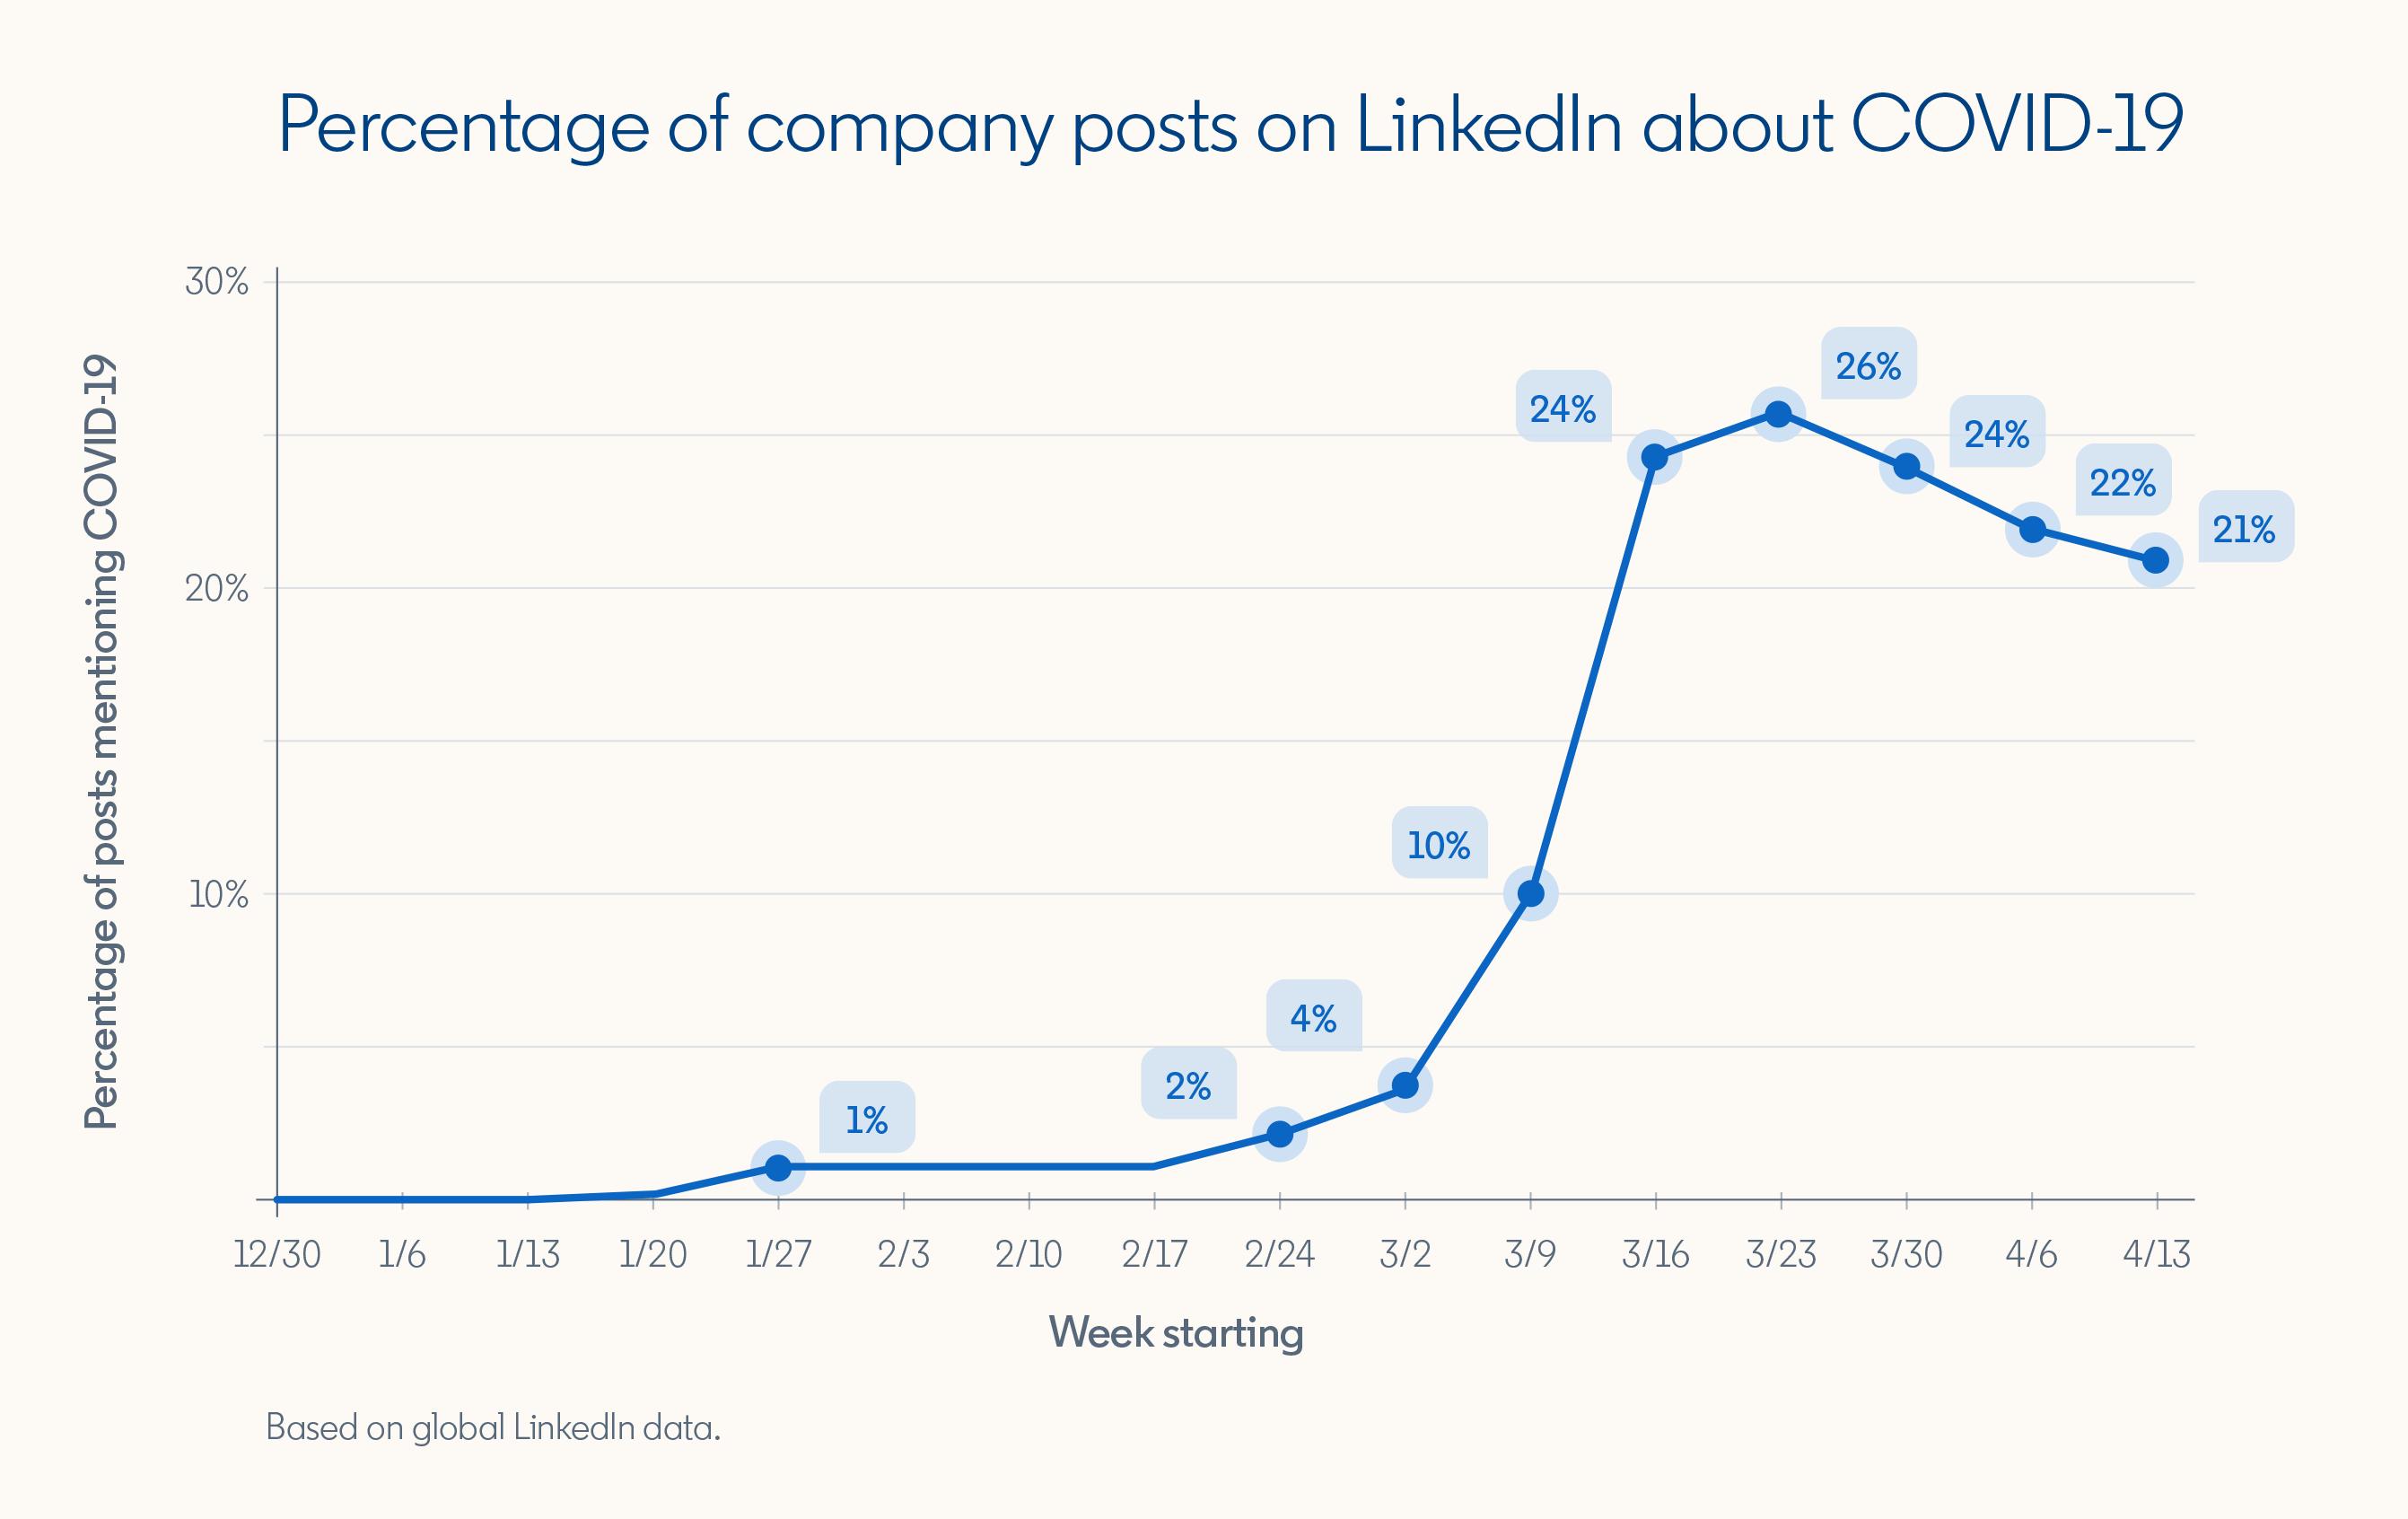 LinkedIn COVID-19 trends